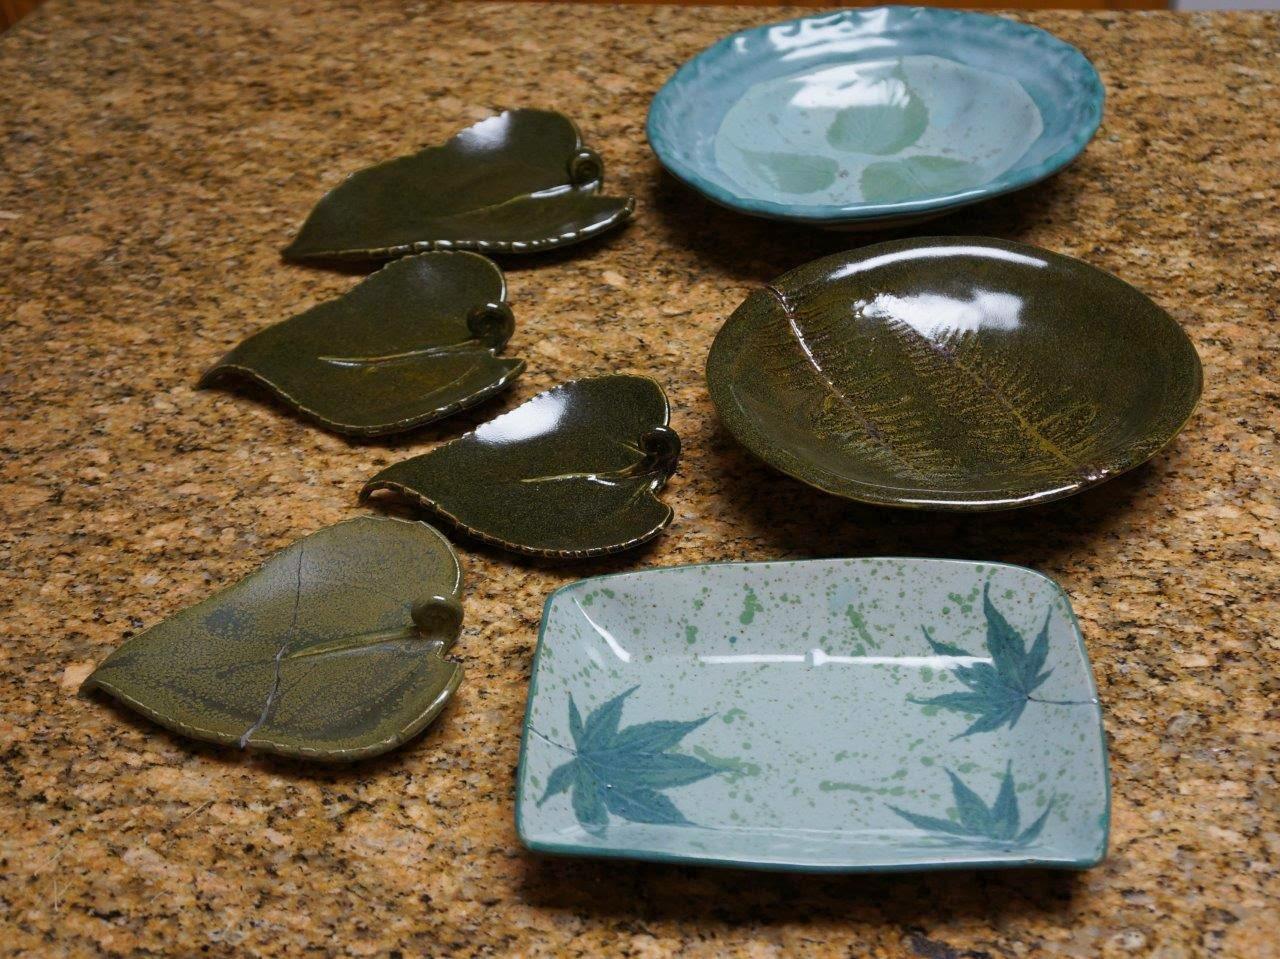 Handmade ceramic stoneware pottery dishes and bowls.